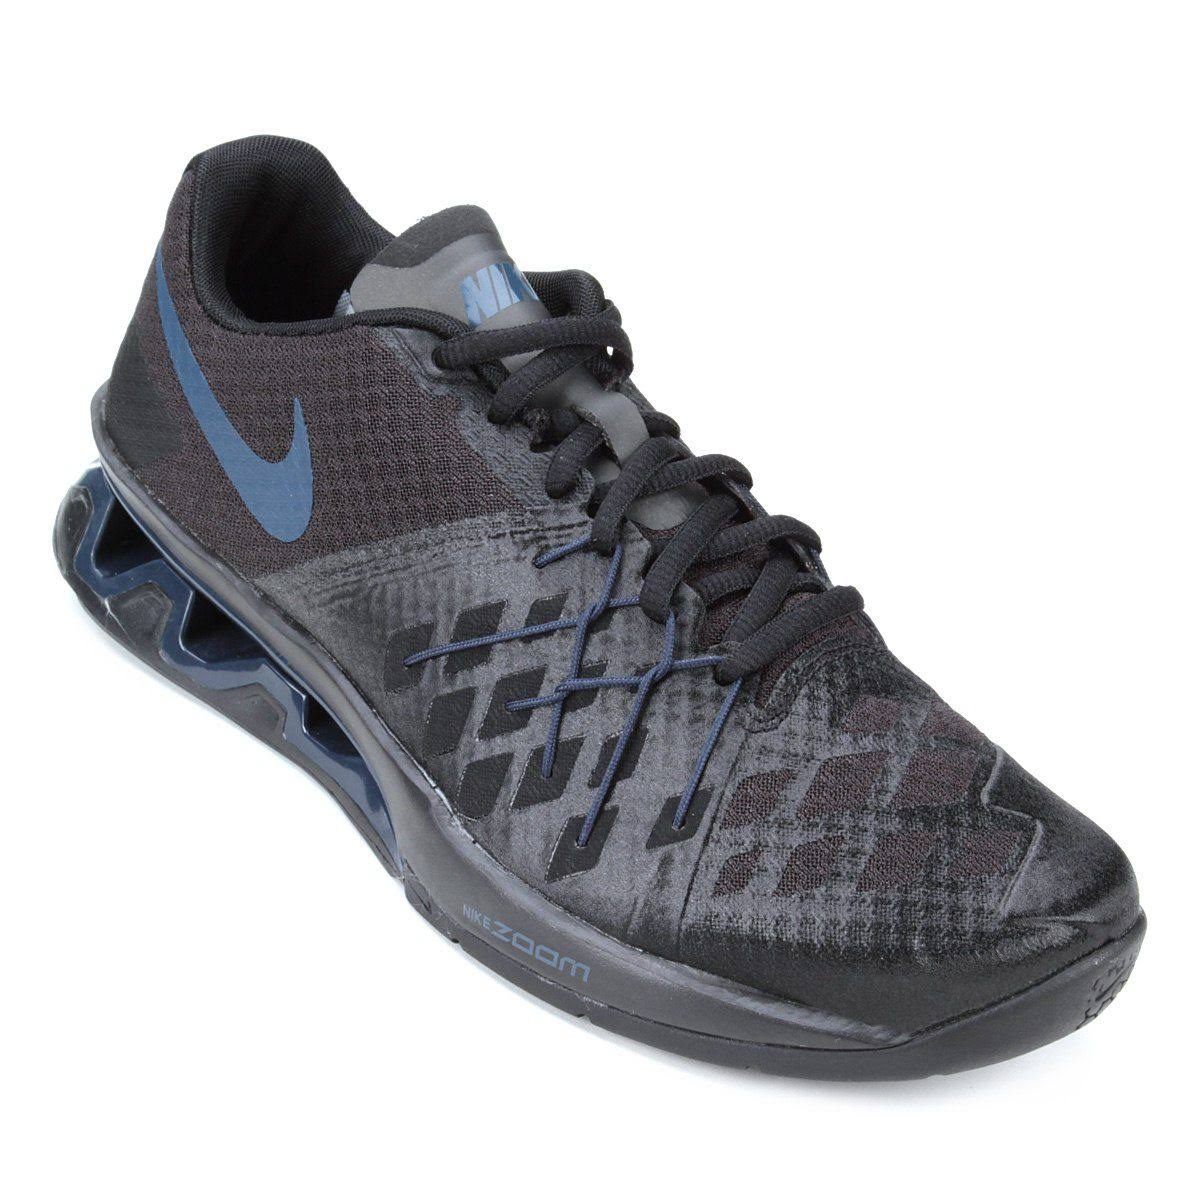 Lightspeed Reax azul Masculino Tênis Nike Preto Azul 2 Preto zUqnwv7